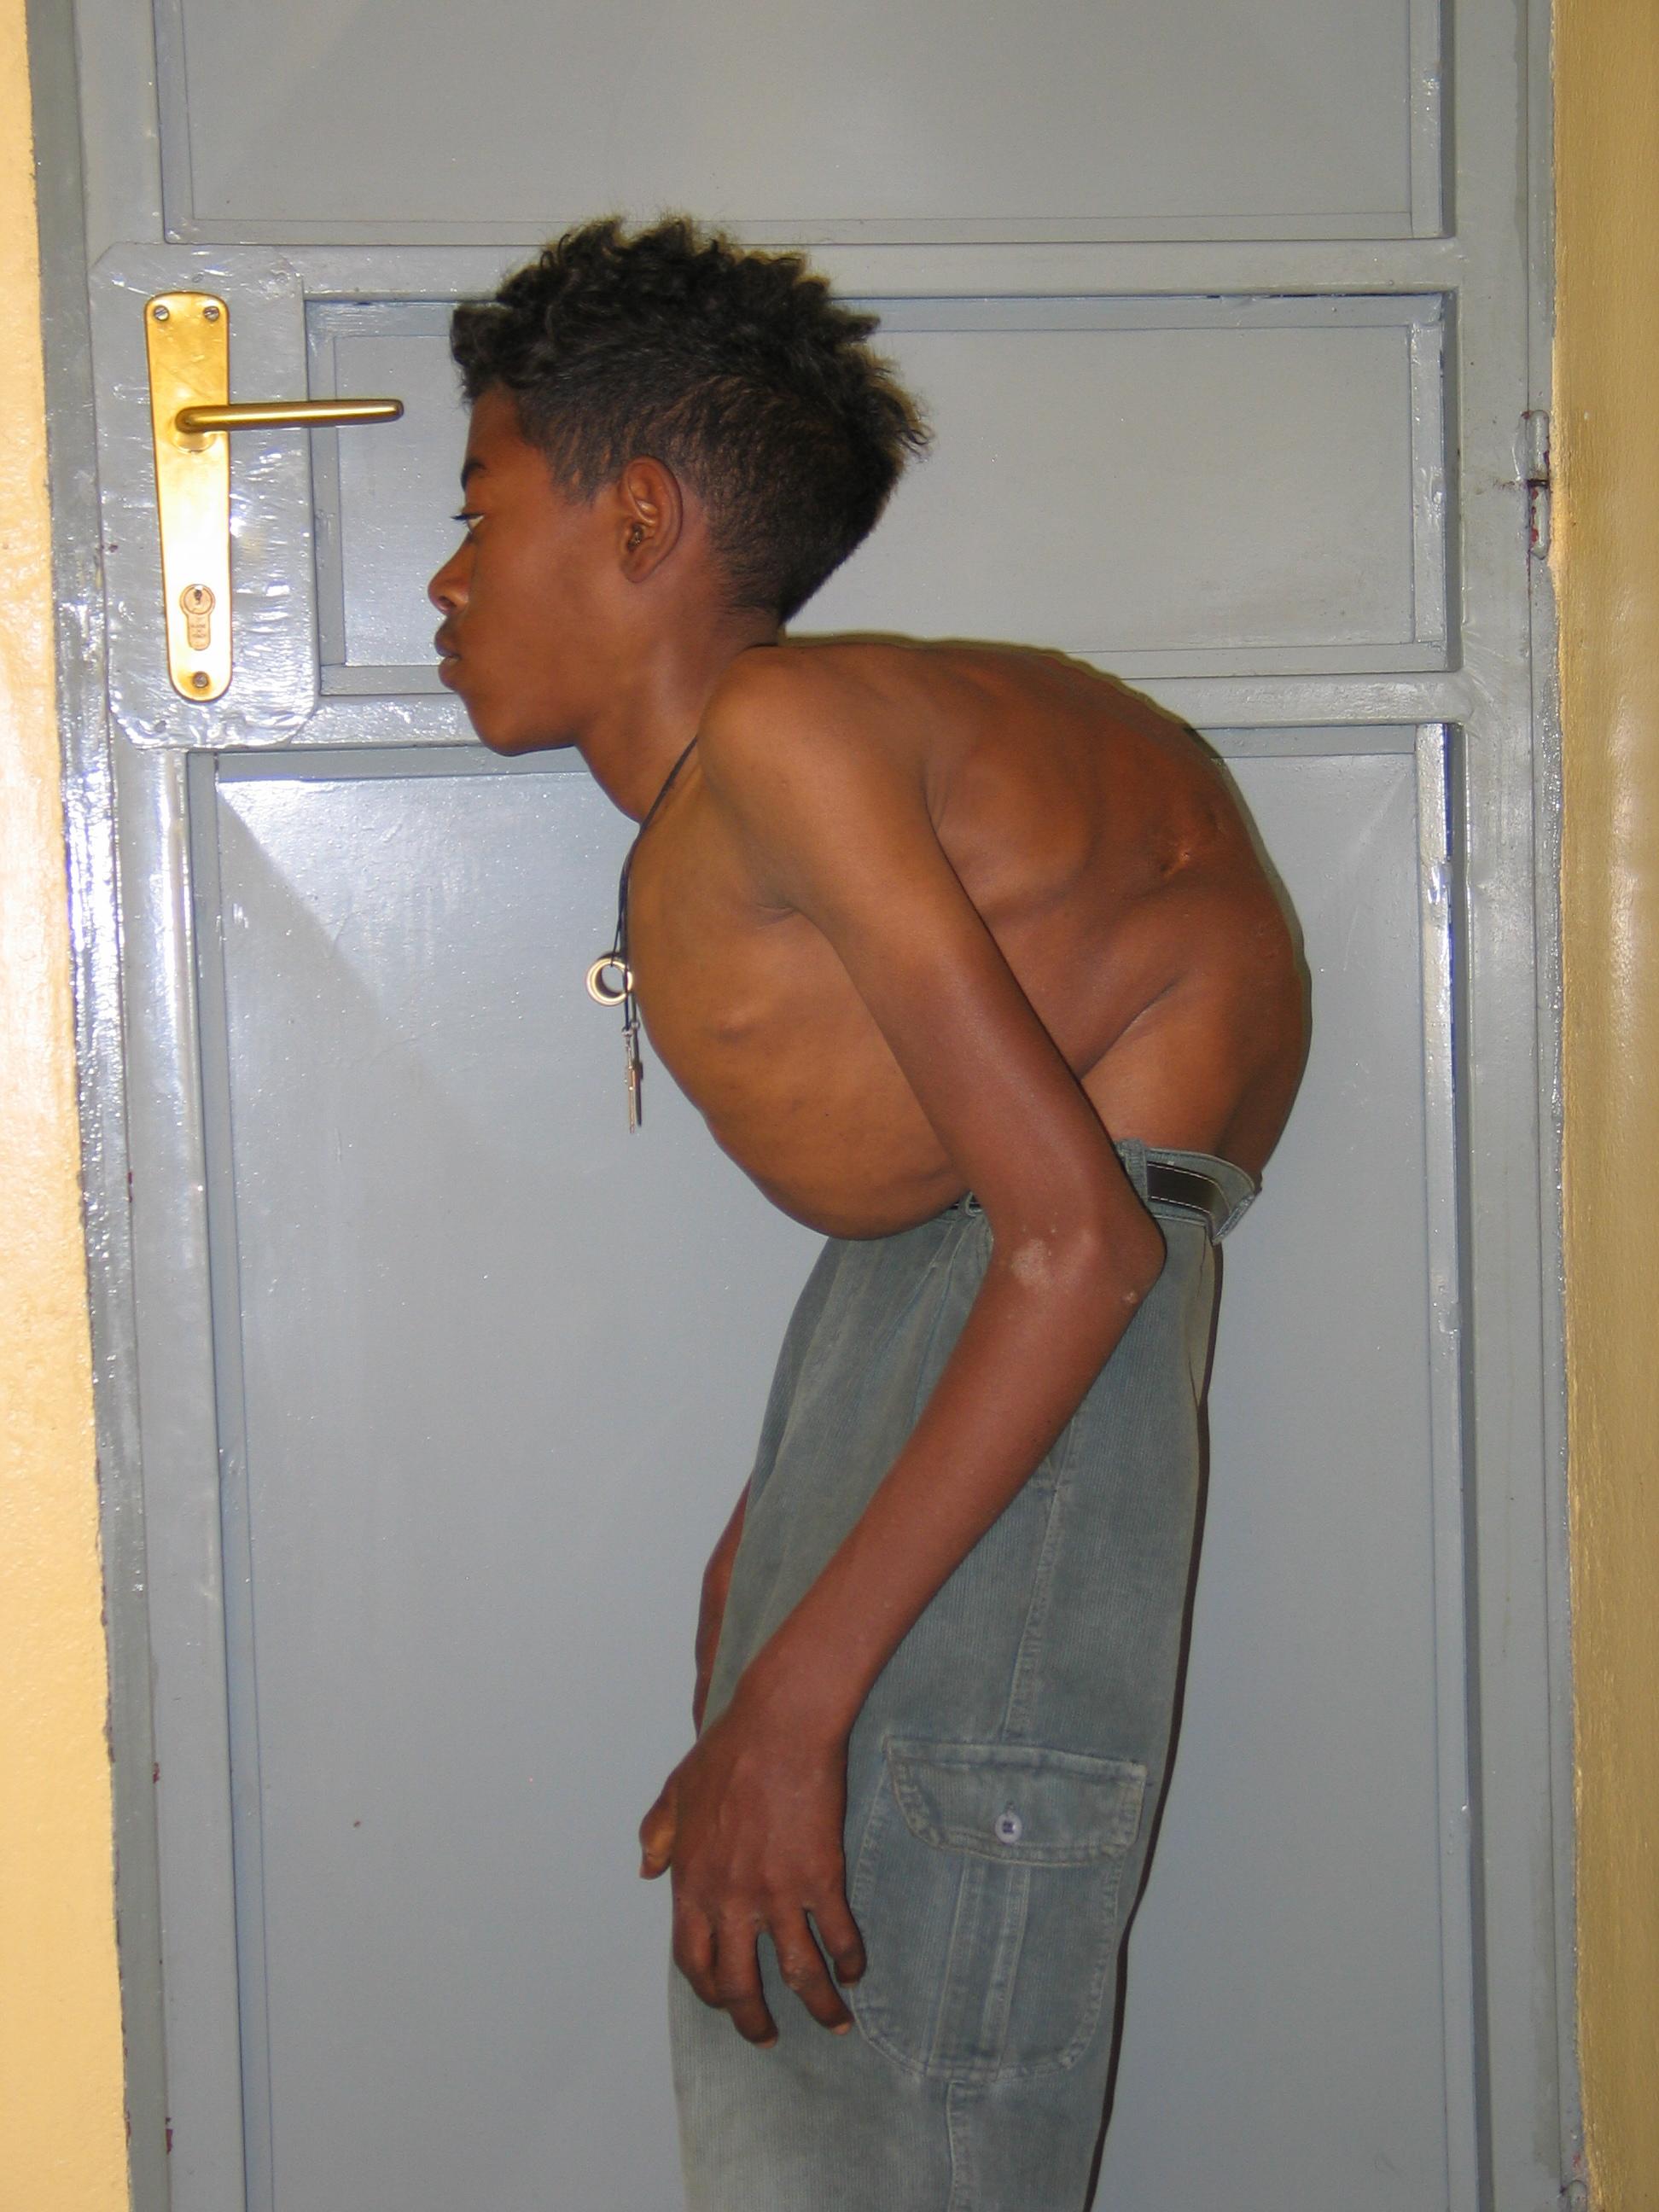 Tesfaye's back before operation